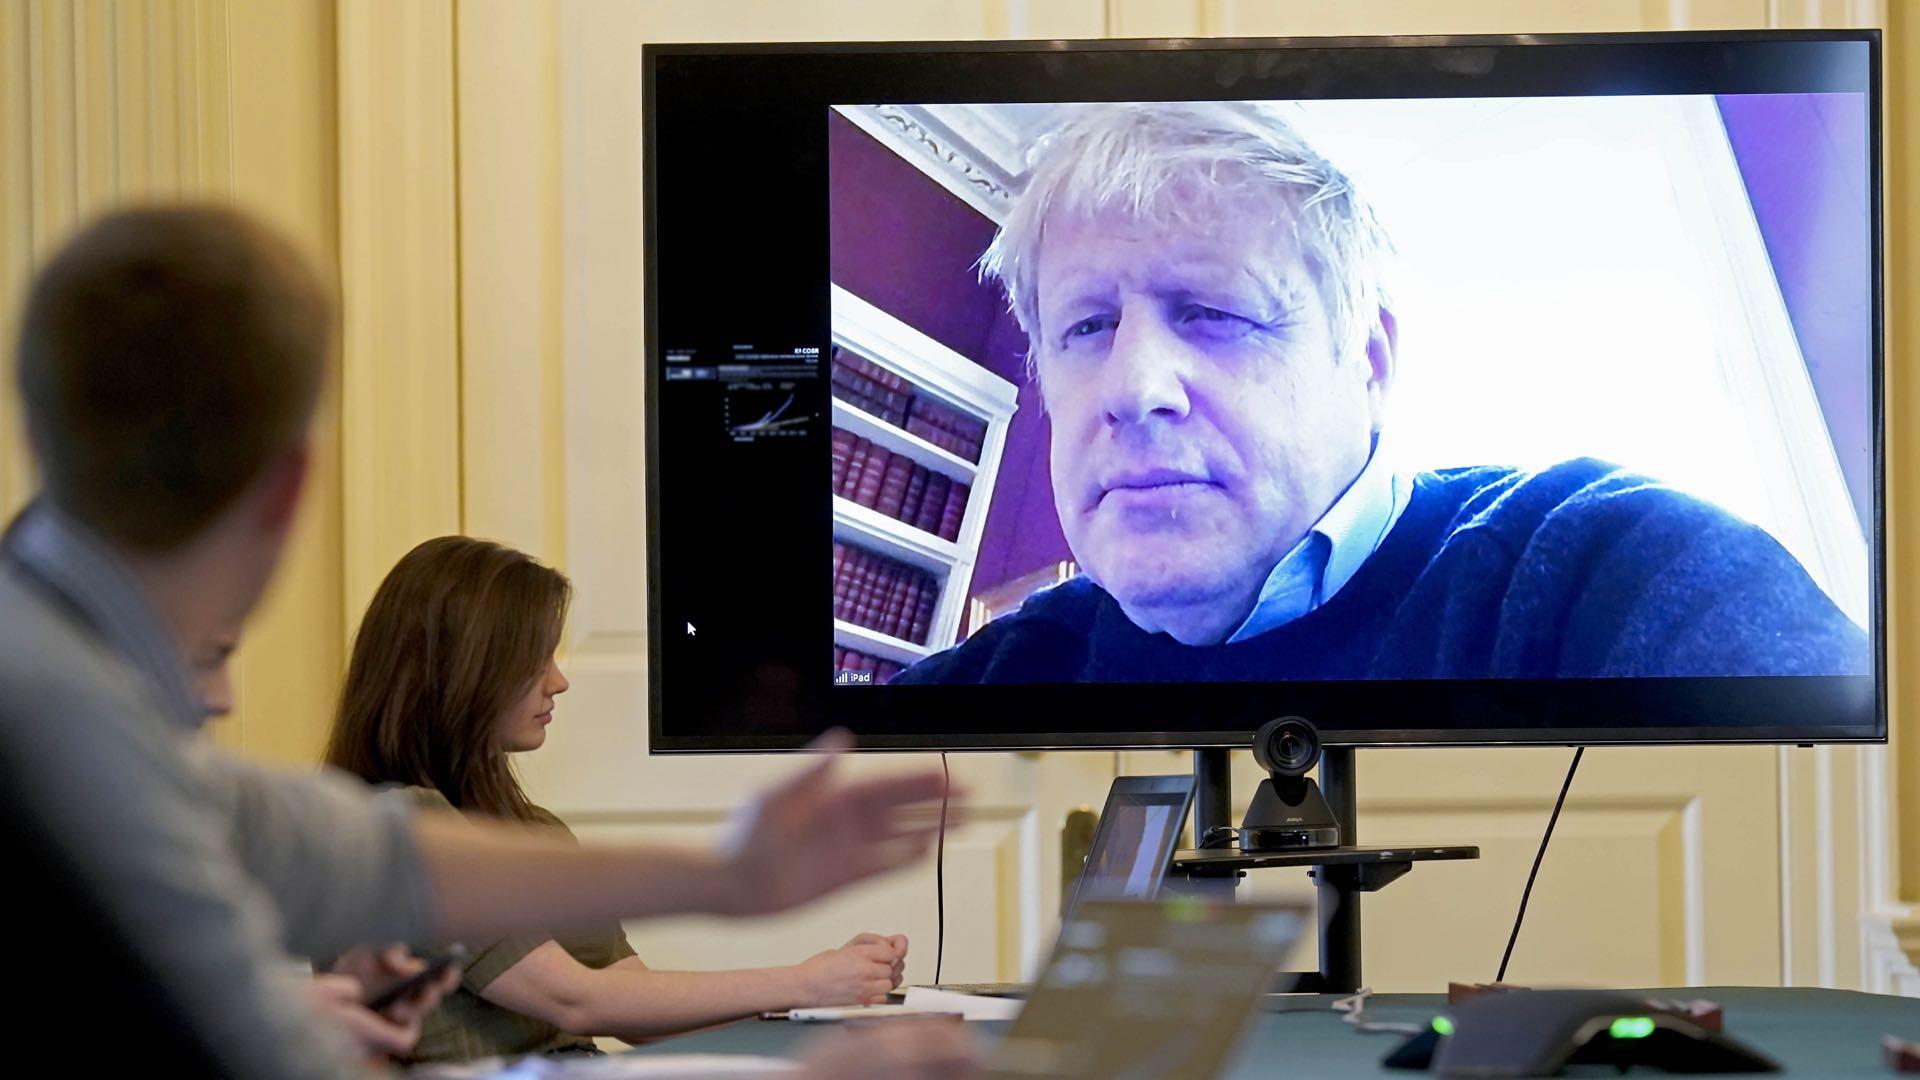 Boris Johnson back on hospital ward with UK in Easter lockdown